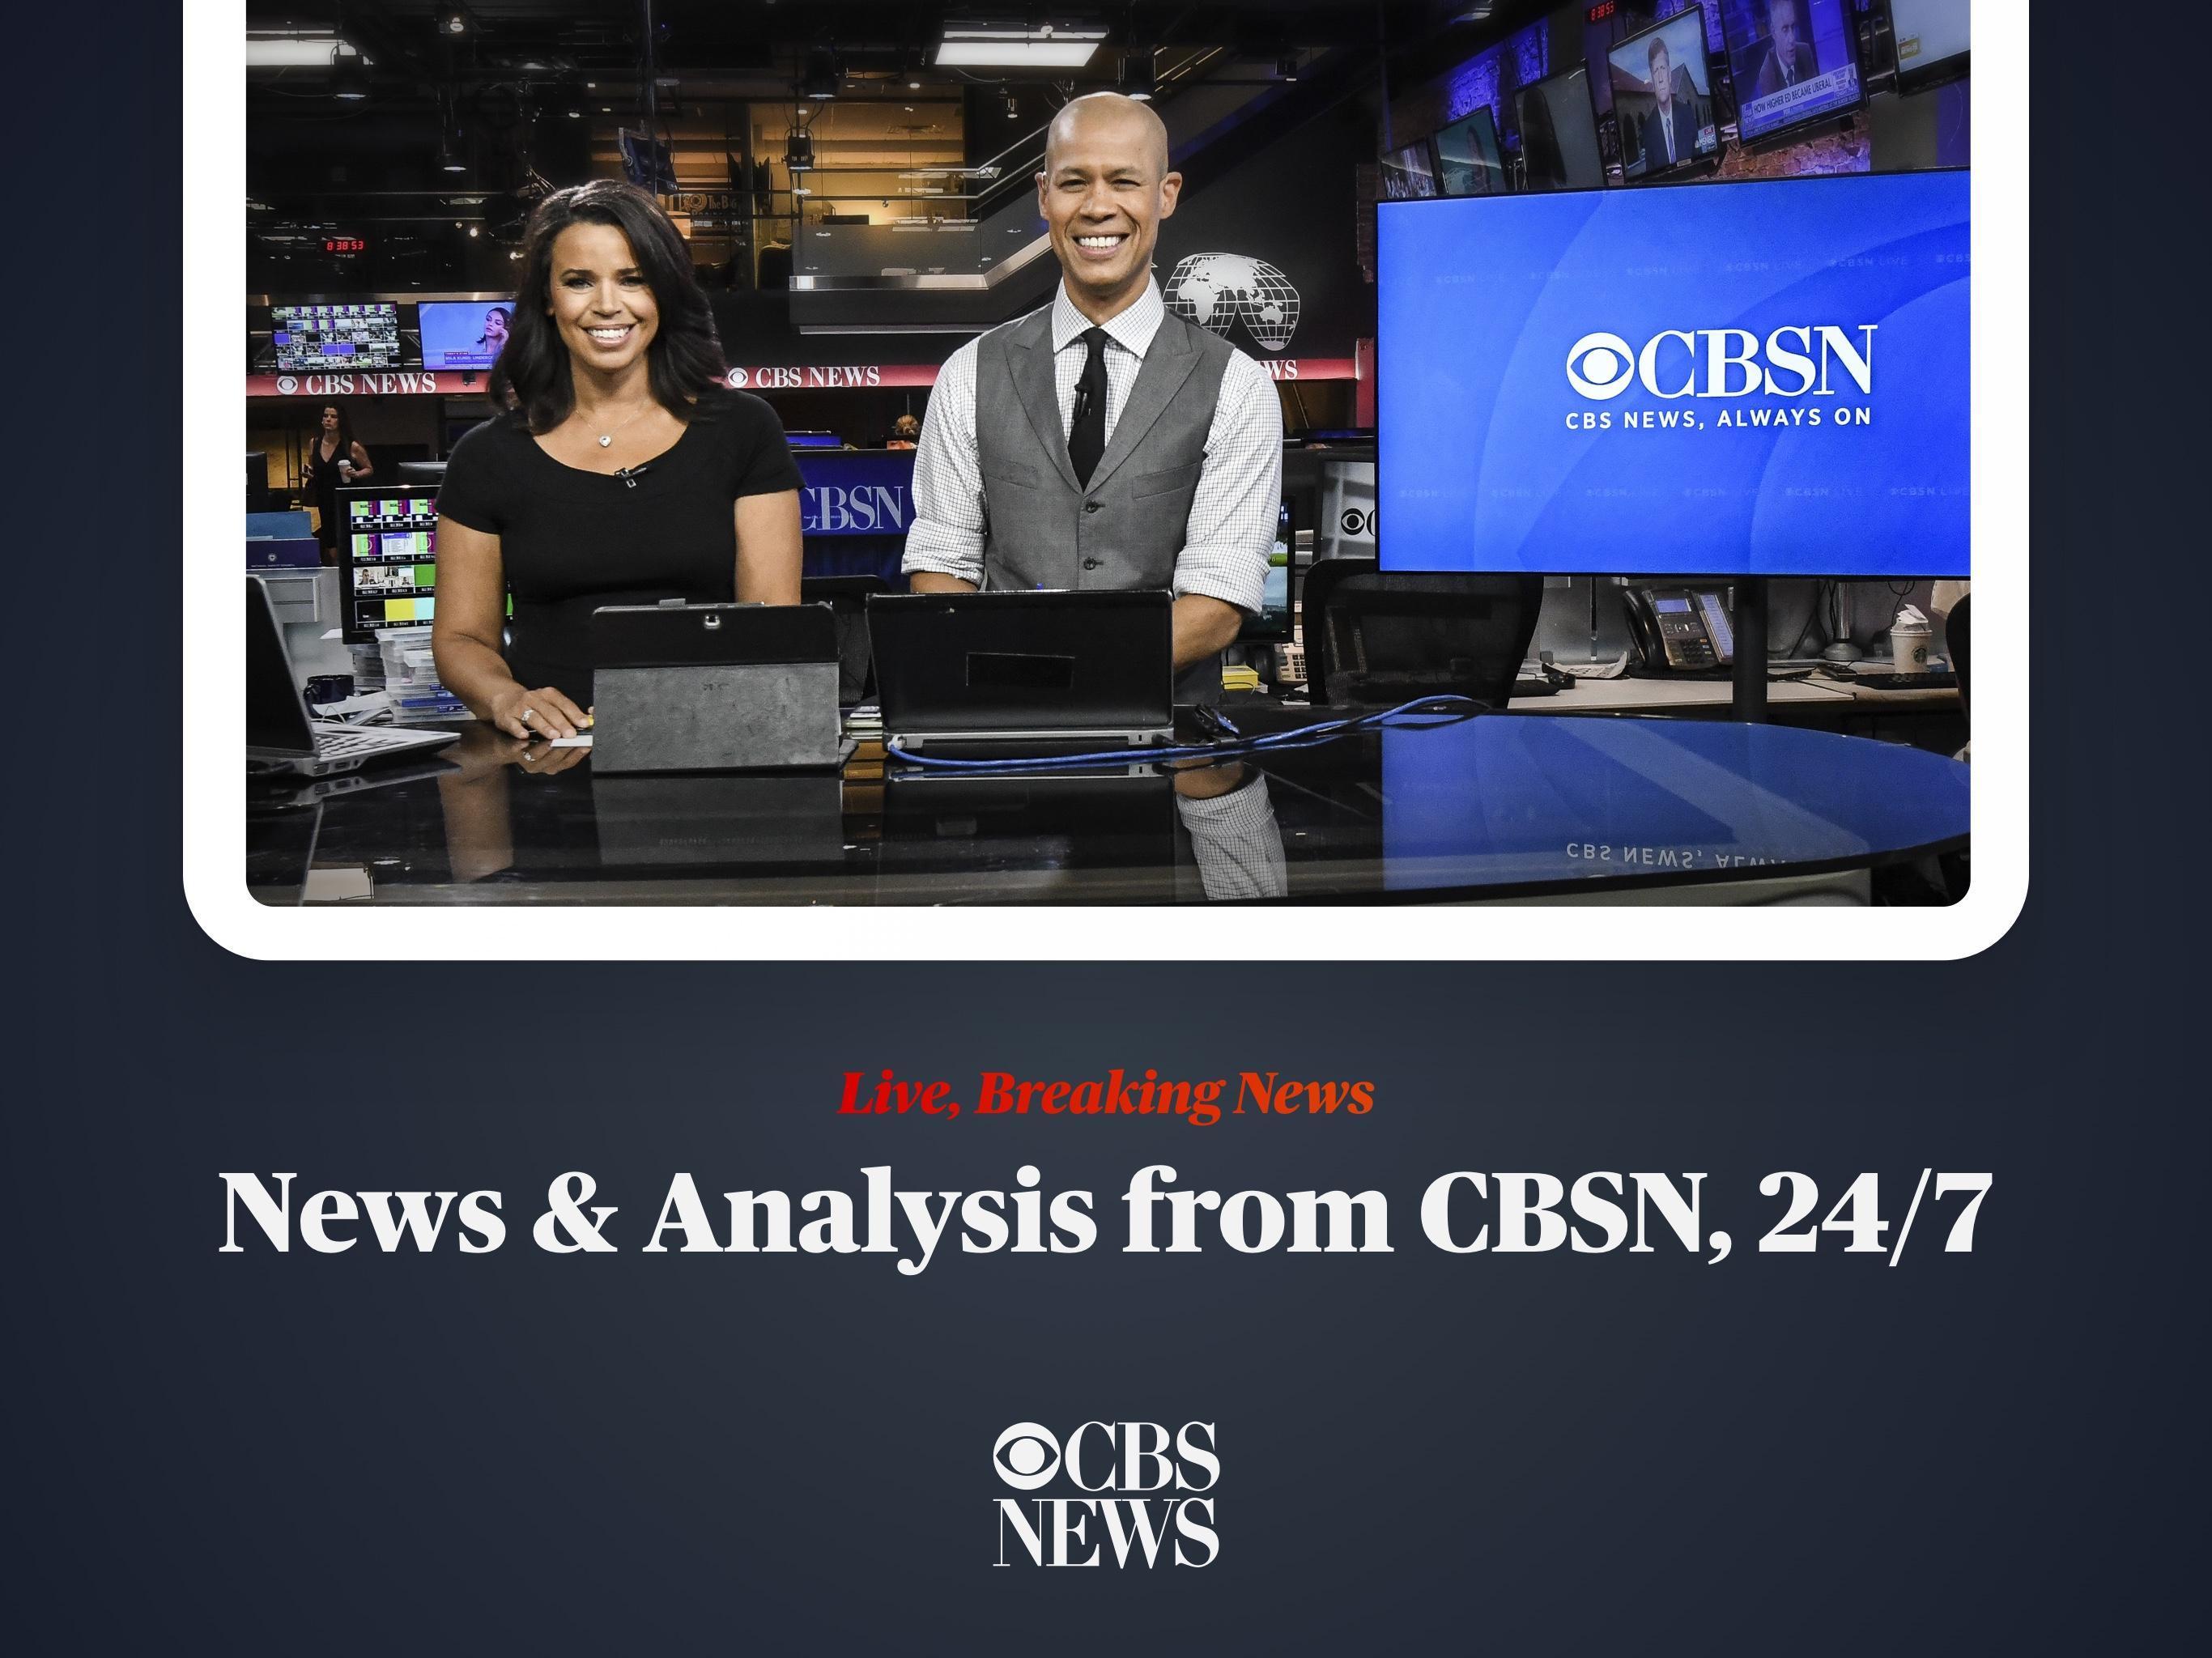 CBS News Live Breaking News 4.1.8 Screenshot 5